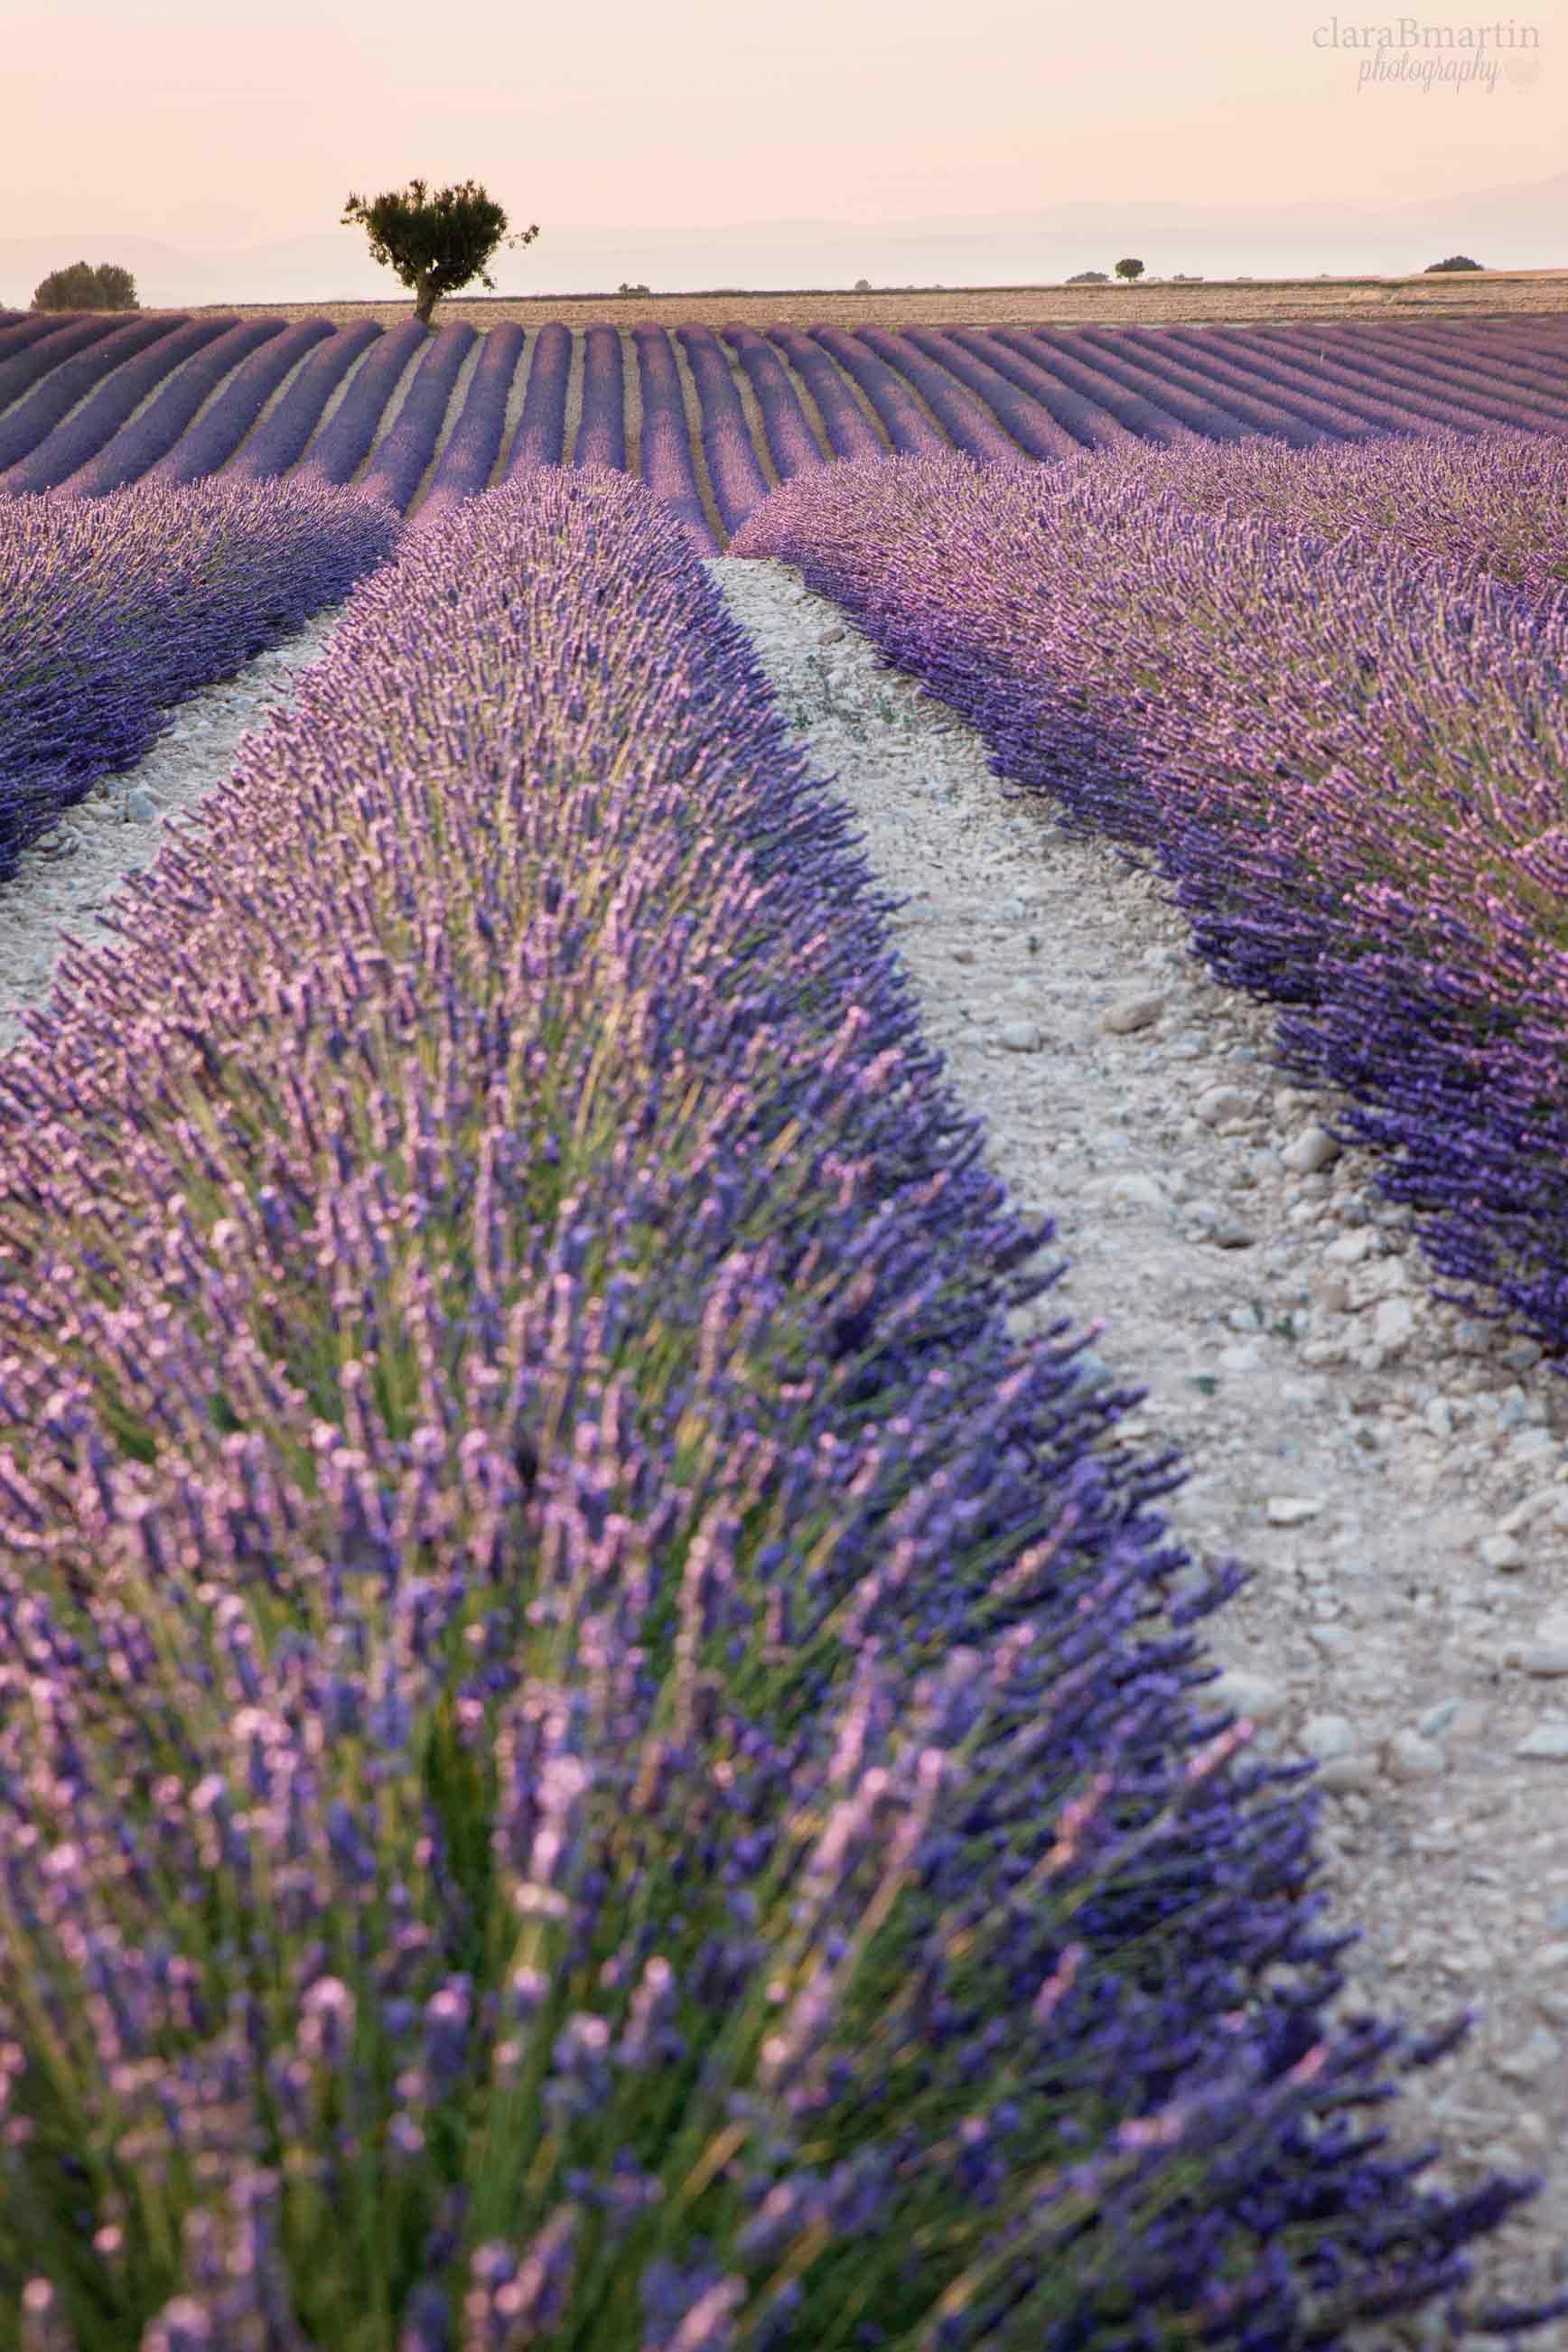 Lavender-fields-Provence-claraBmartin12